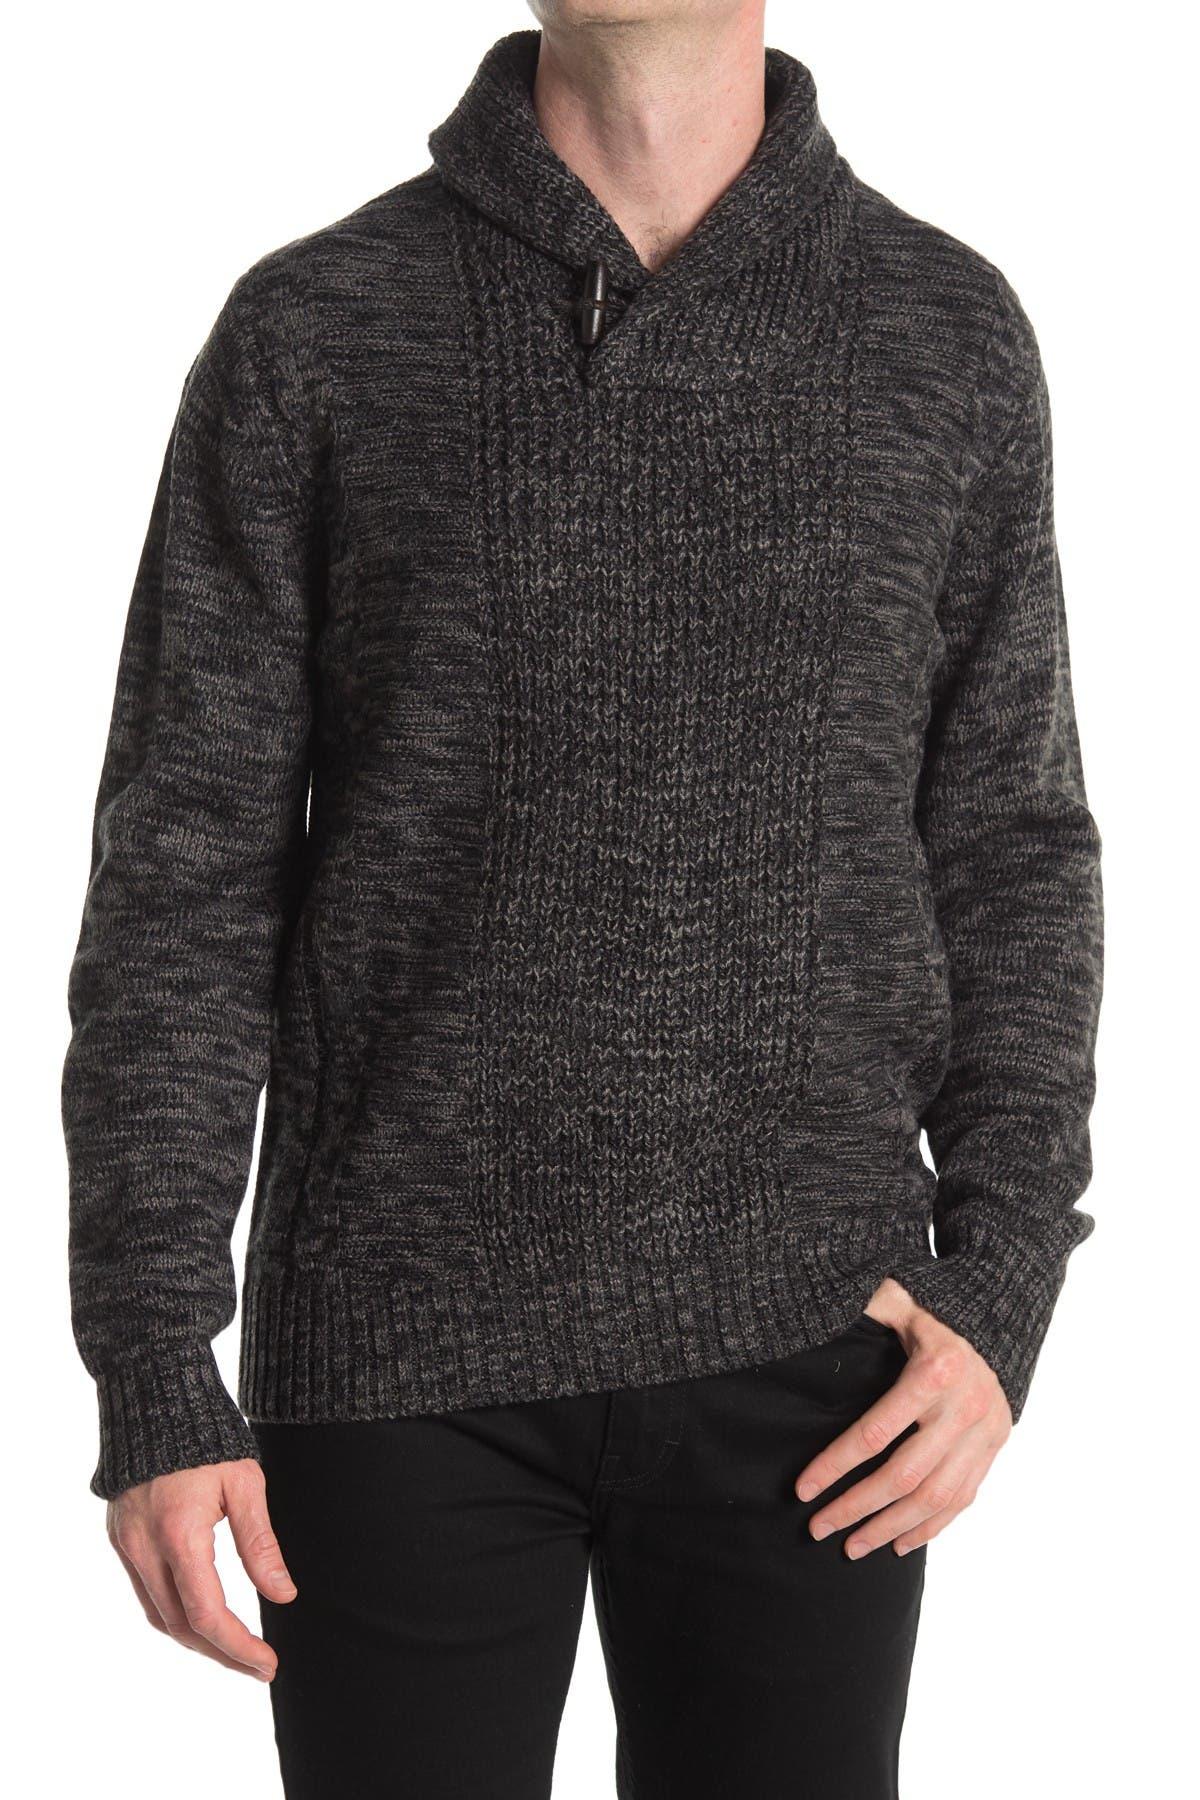 Image of weatherproof Marled Shawl Collar Pullover